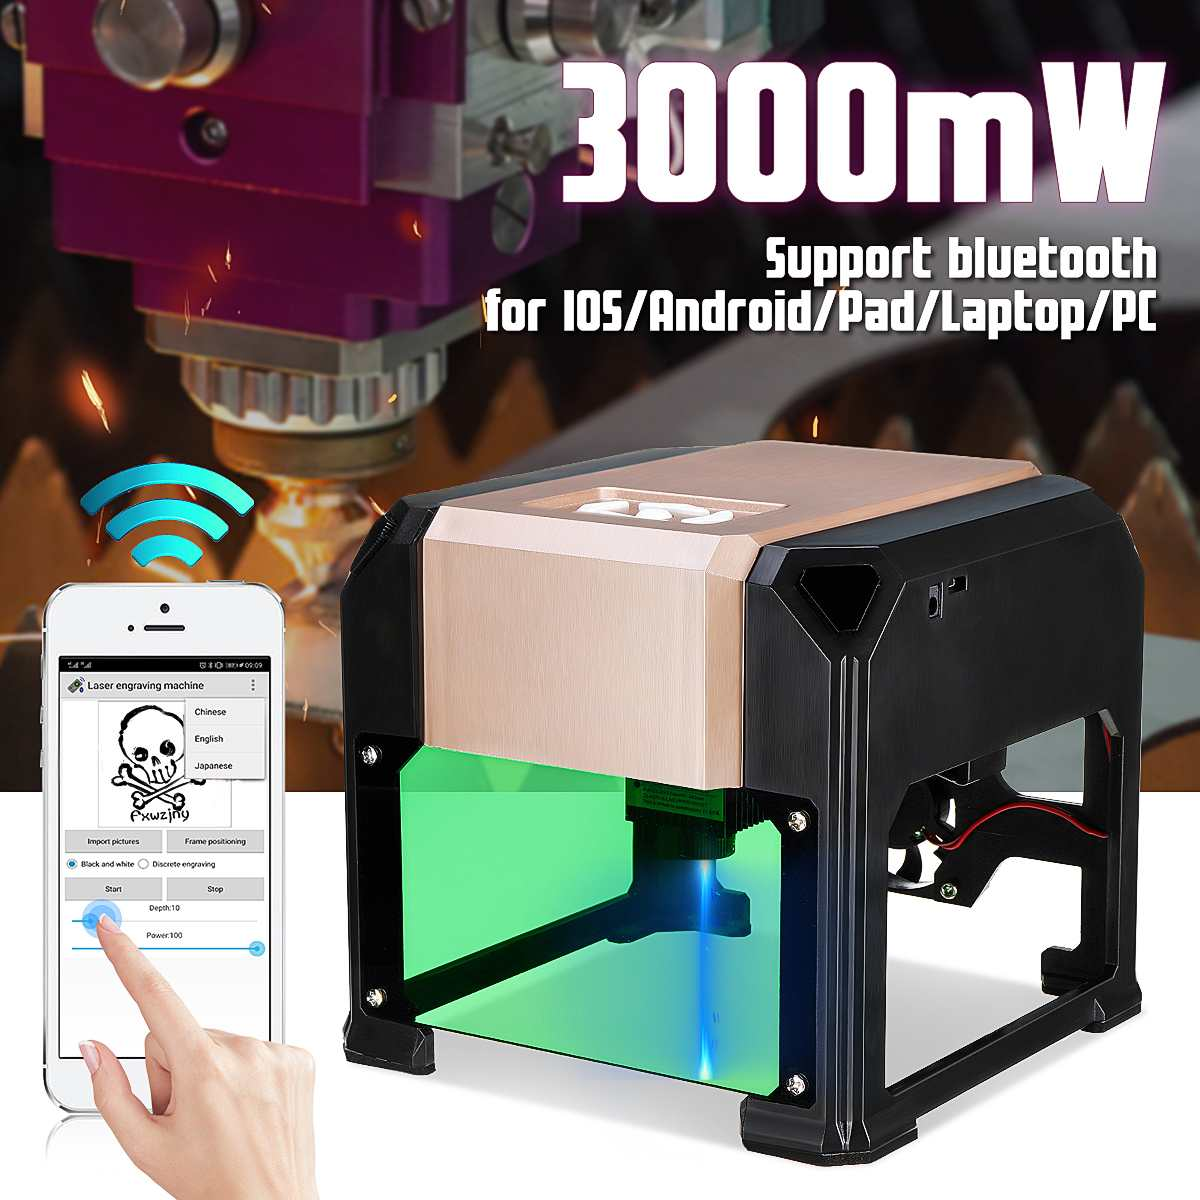 Bluetooth Control 3000mW Professionelle DIY Desktop Mini CNC Laser Engraver Cutter Gravur Holz Schneiden Maschine Router 110-220V